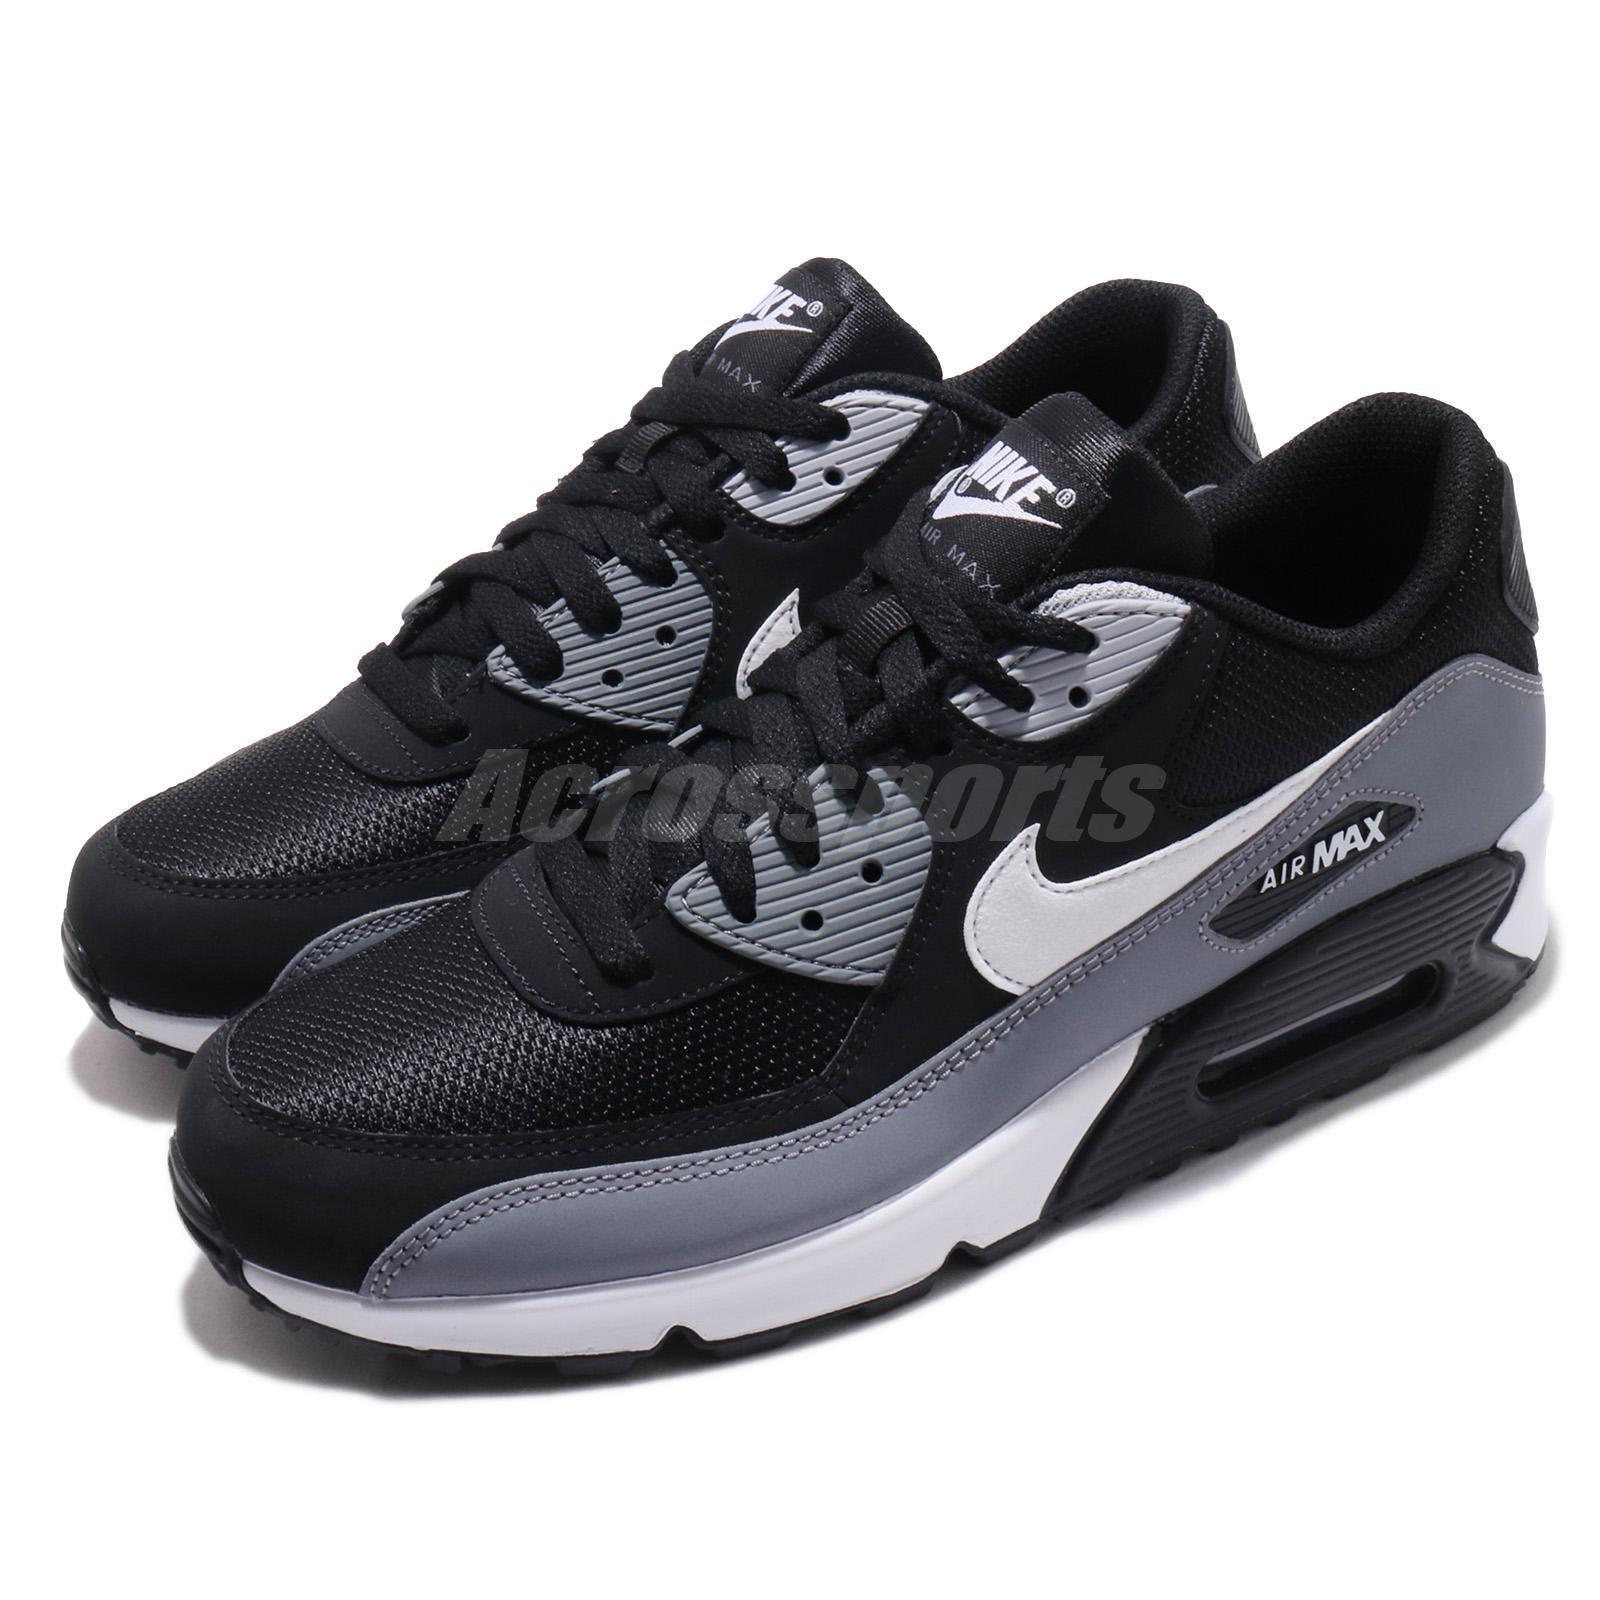 Nike Air Max 90 Essential Black White Grey Men Running shoes Sneakers AJ1285-018